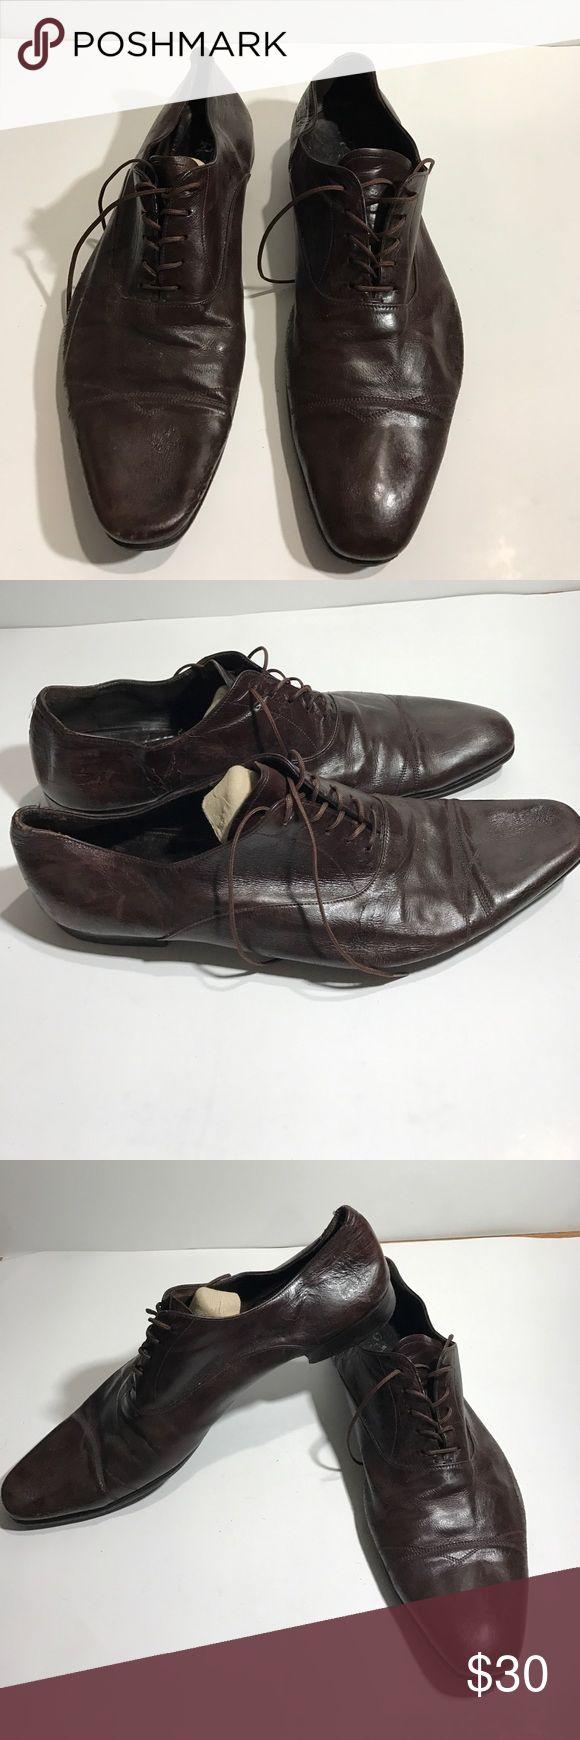 PRADA WINE COLOR Dress shoe Men's size 11 PRADA dress shoe in wine color Prada Shoes Oxfords & Derbys